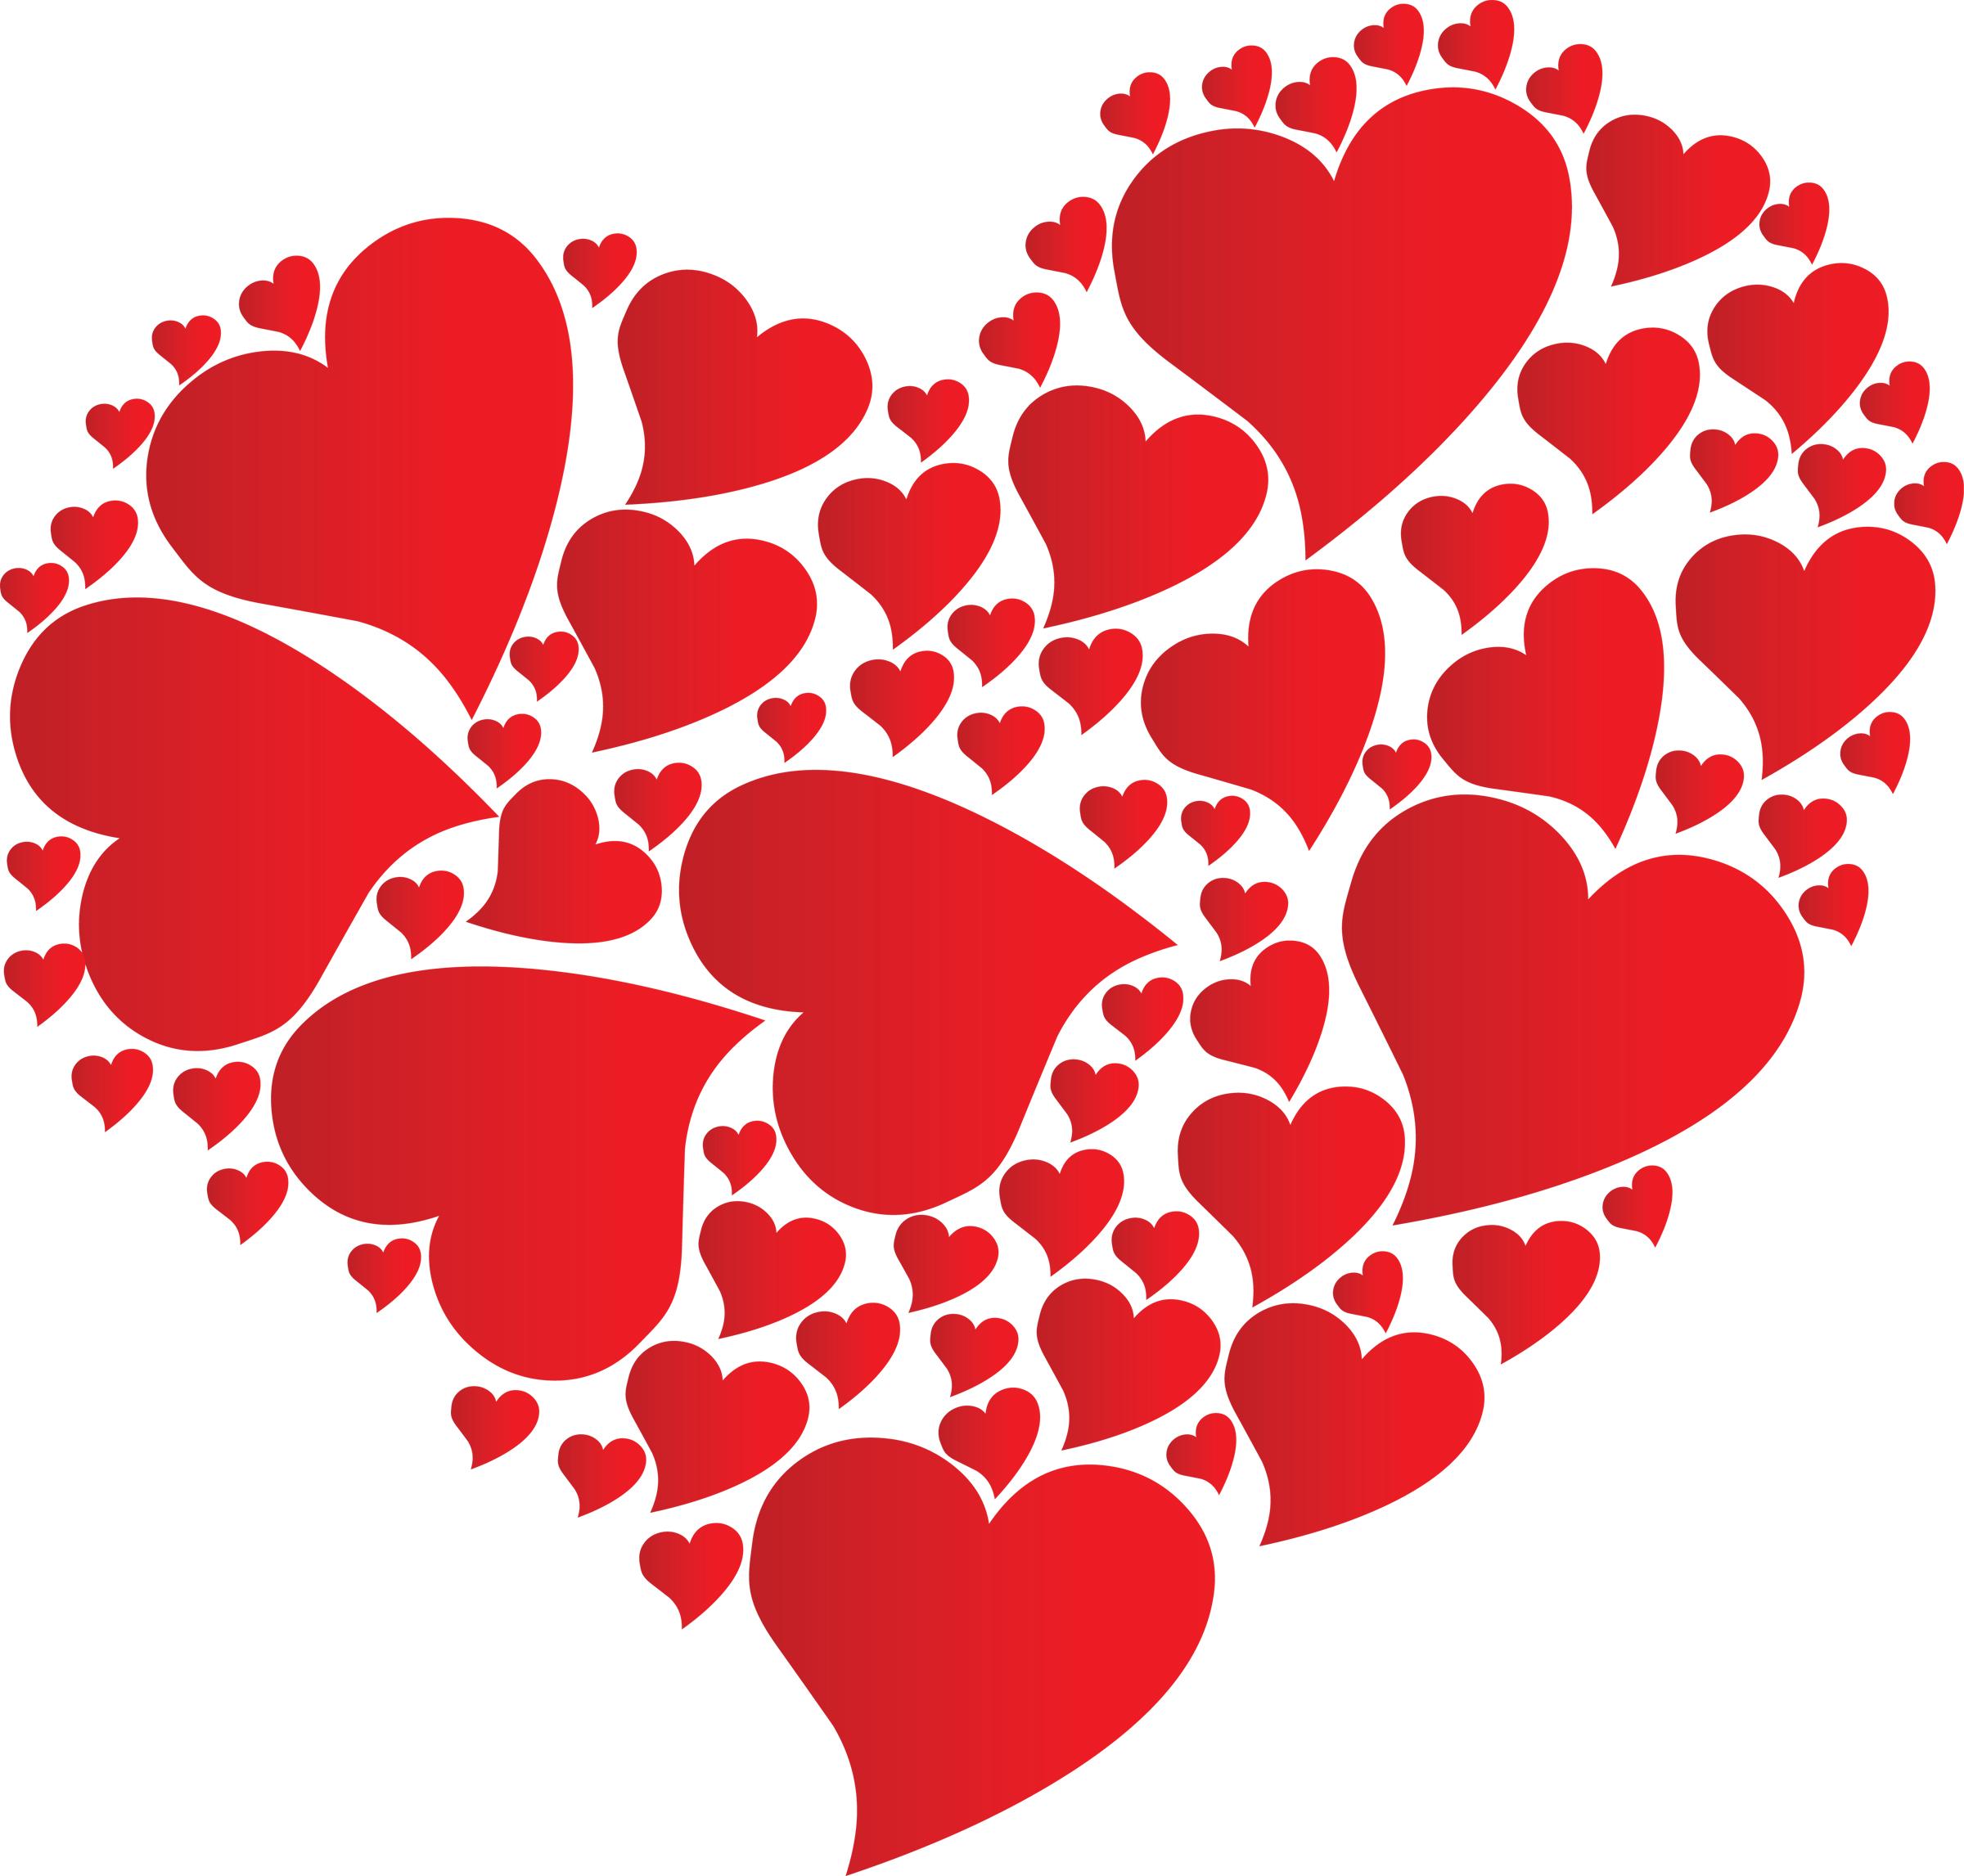 Broken Heart clipart valentine's day dance Us http:// Yolanda of Love